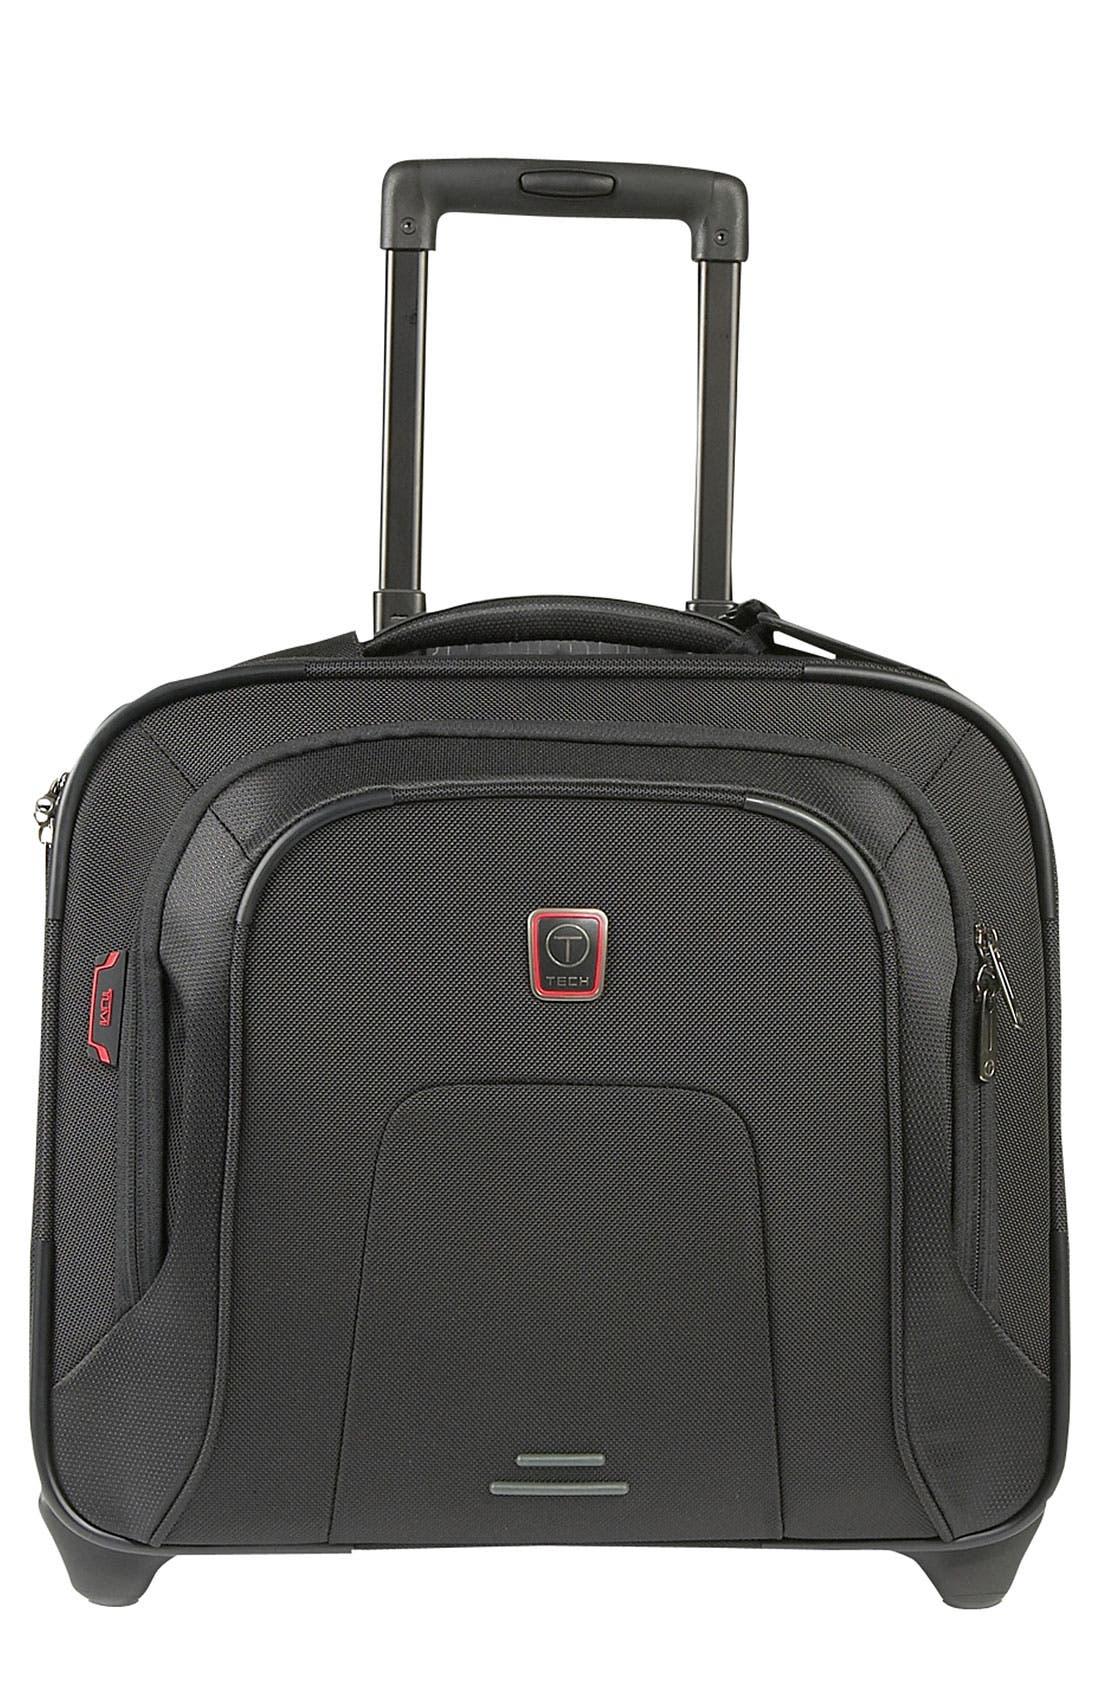 Main Image - T-Tech by Tumi 'Presidio MacArthur' Wheeled Compact Laptop Briefcase